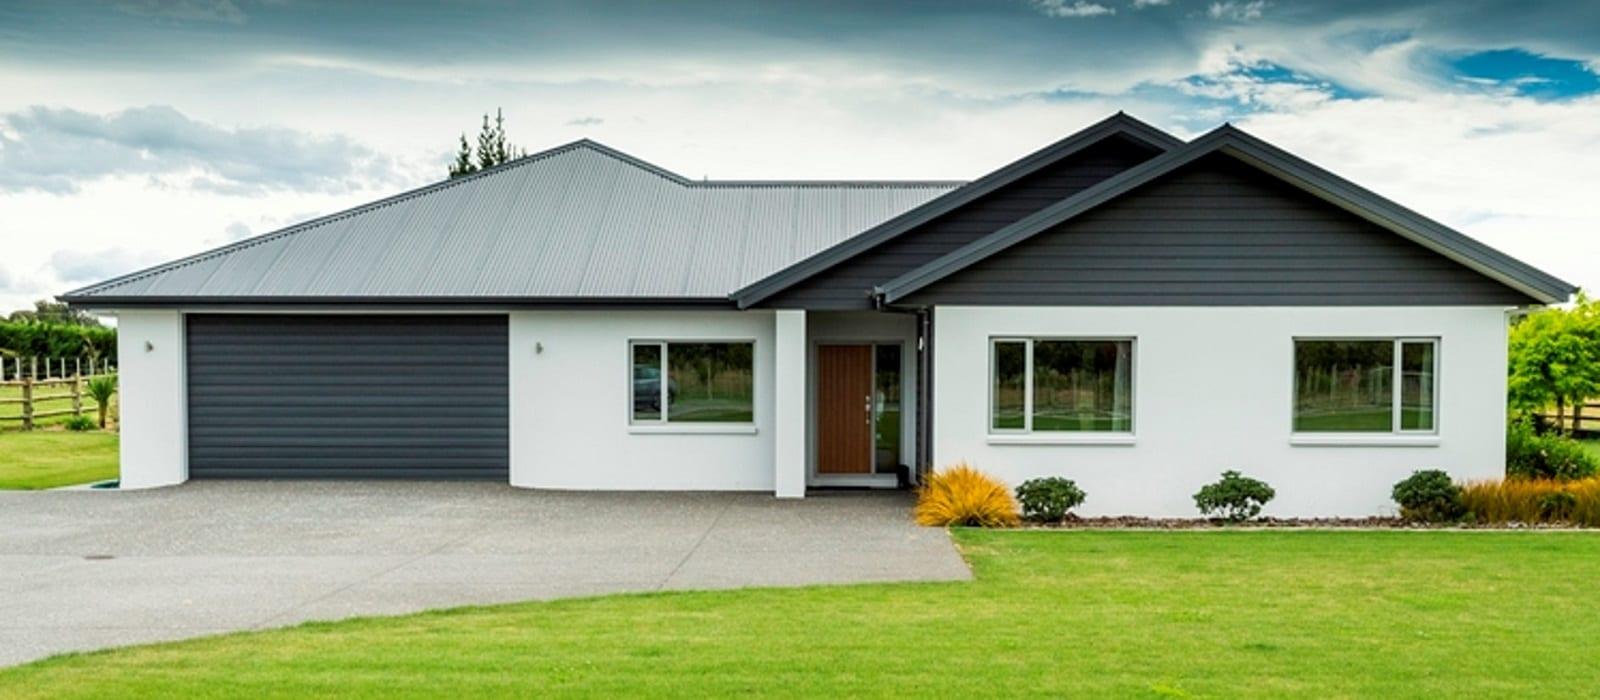 fmg-home-customer-satisfaction